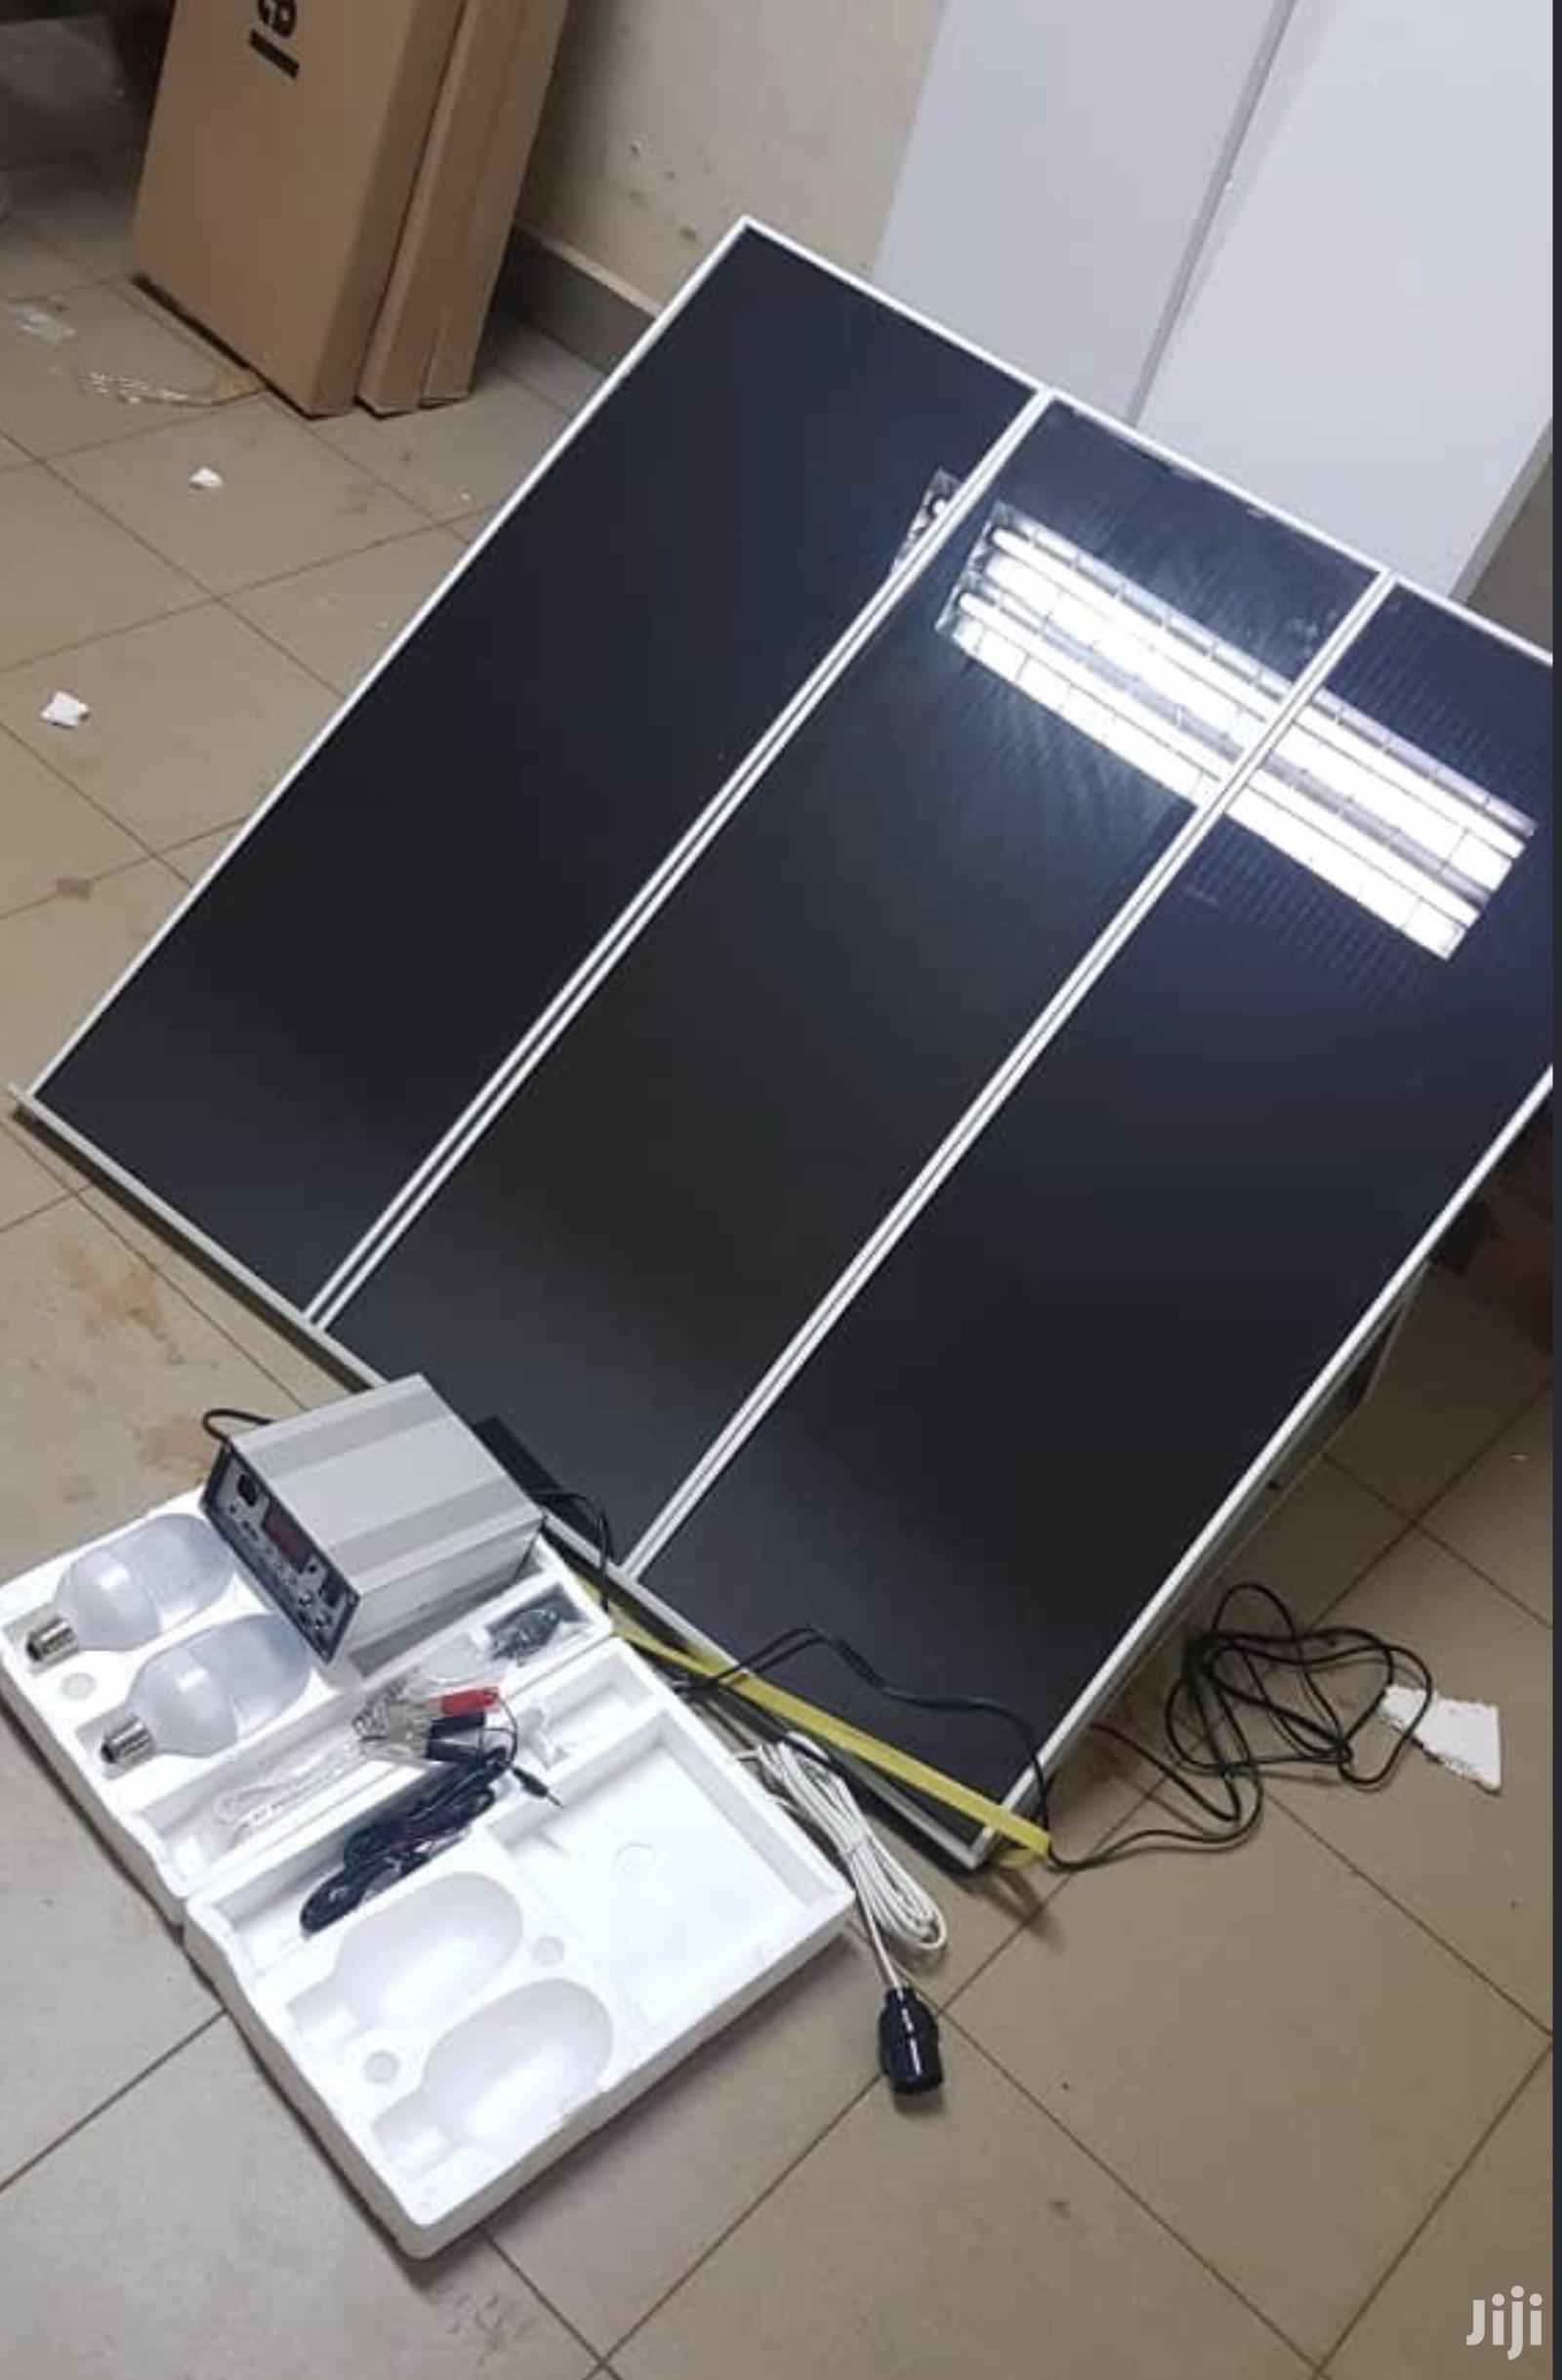 45 Watts Solar Power Back Up Kit With Regulator And 2 Bulbs